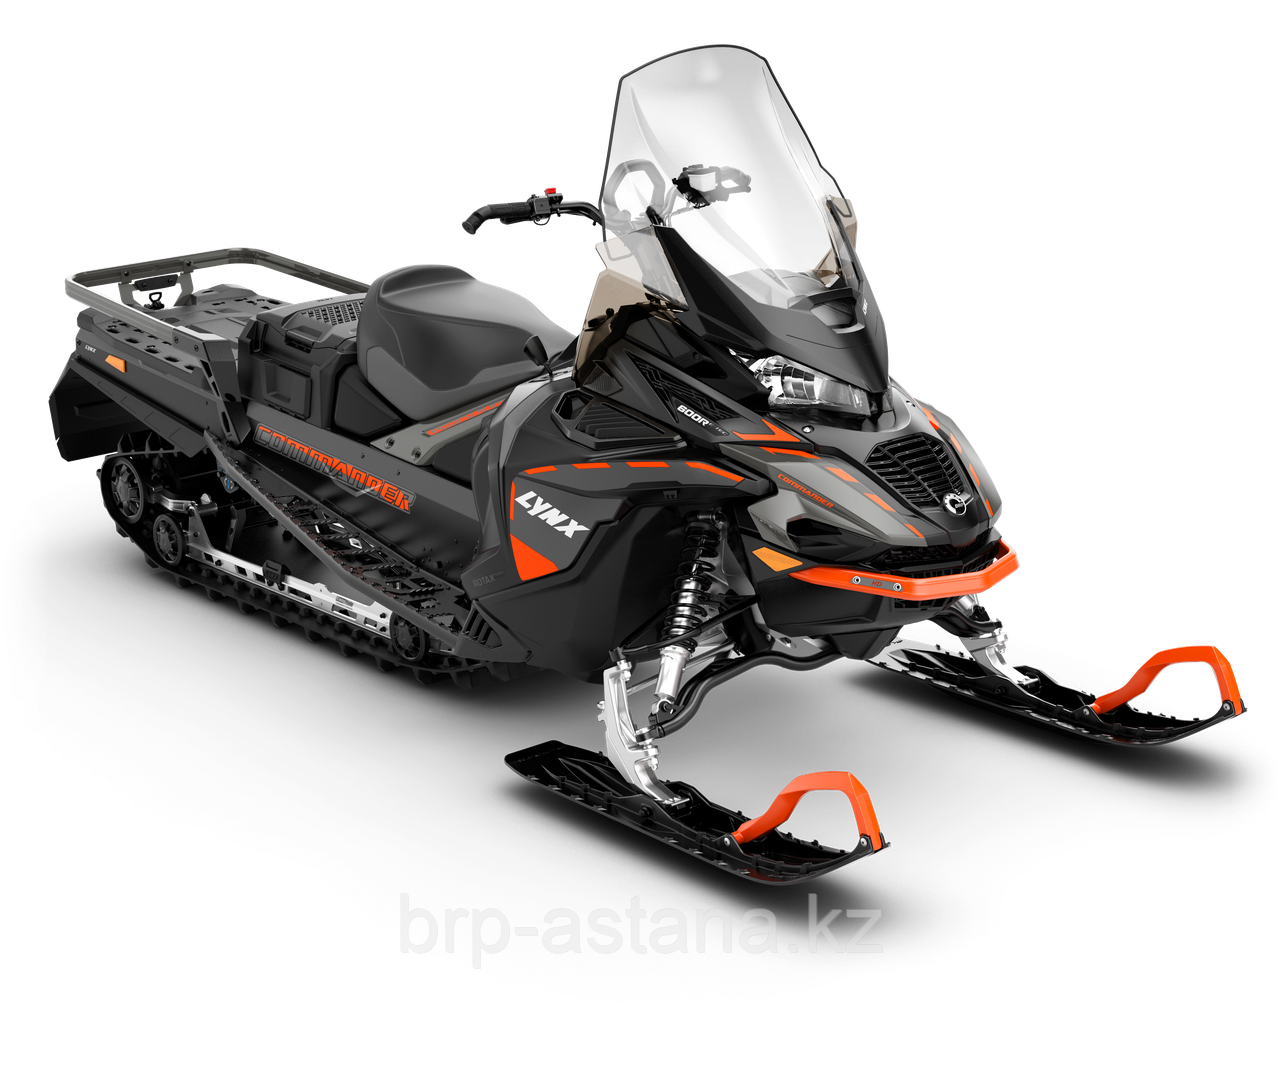 Снегоход Commander Studded track 38 mm 900 ACE Turbo Черно-серый 2021